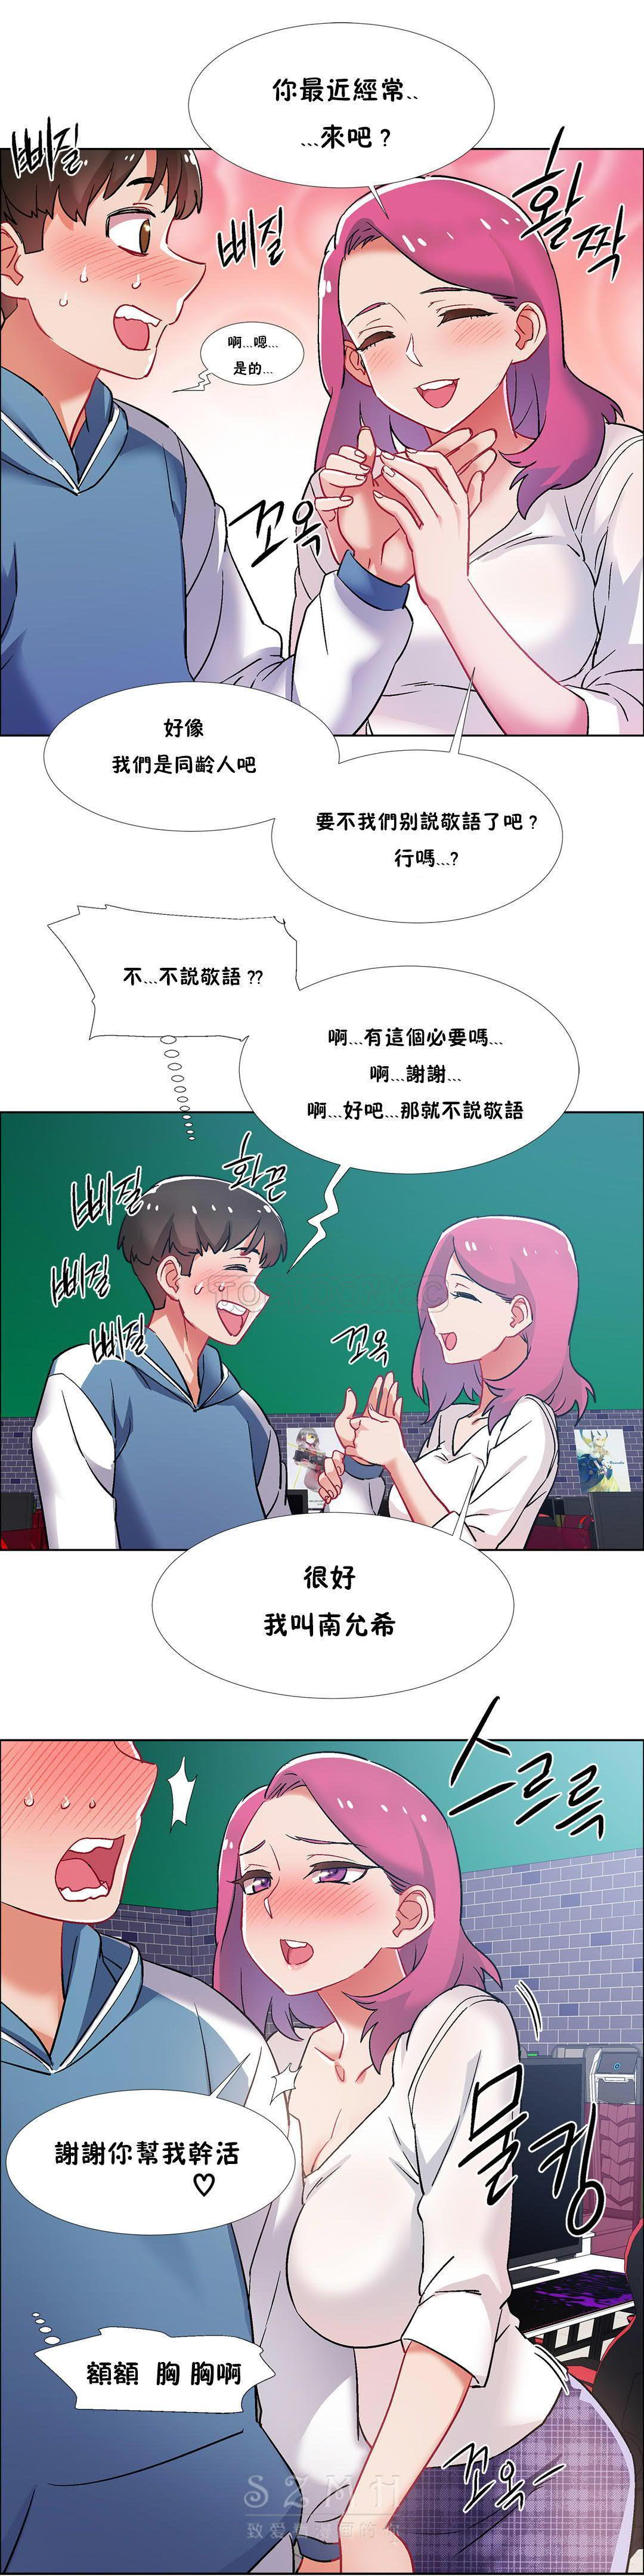 [Studio Wannabe] Rental Girls | 出租女郎 Ch. 33-58 [Chinese]  第二季 完结 71